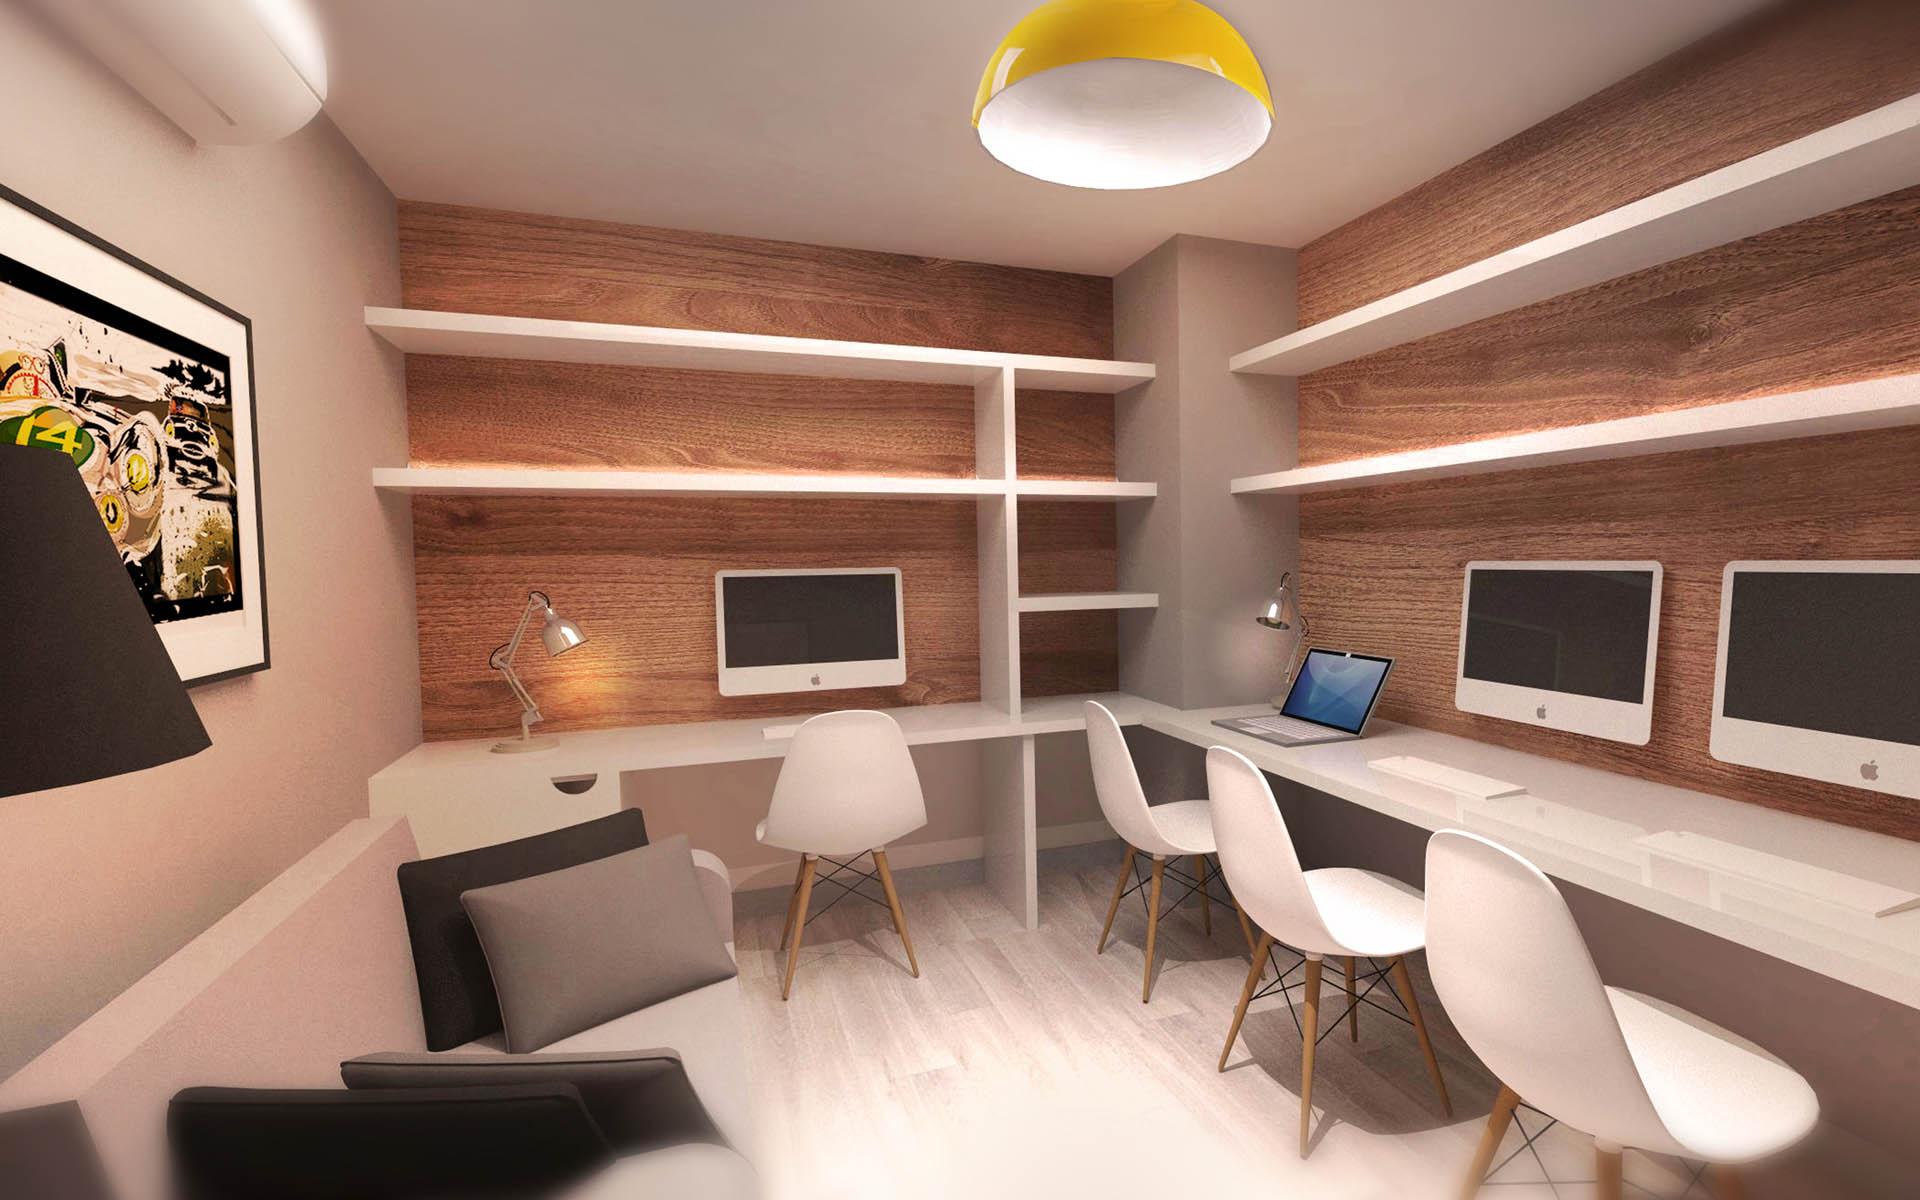 projet d 39 int rieur d 39 un appartement bureau aix red banana